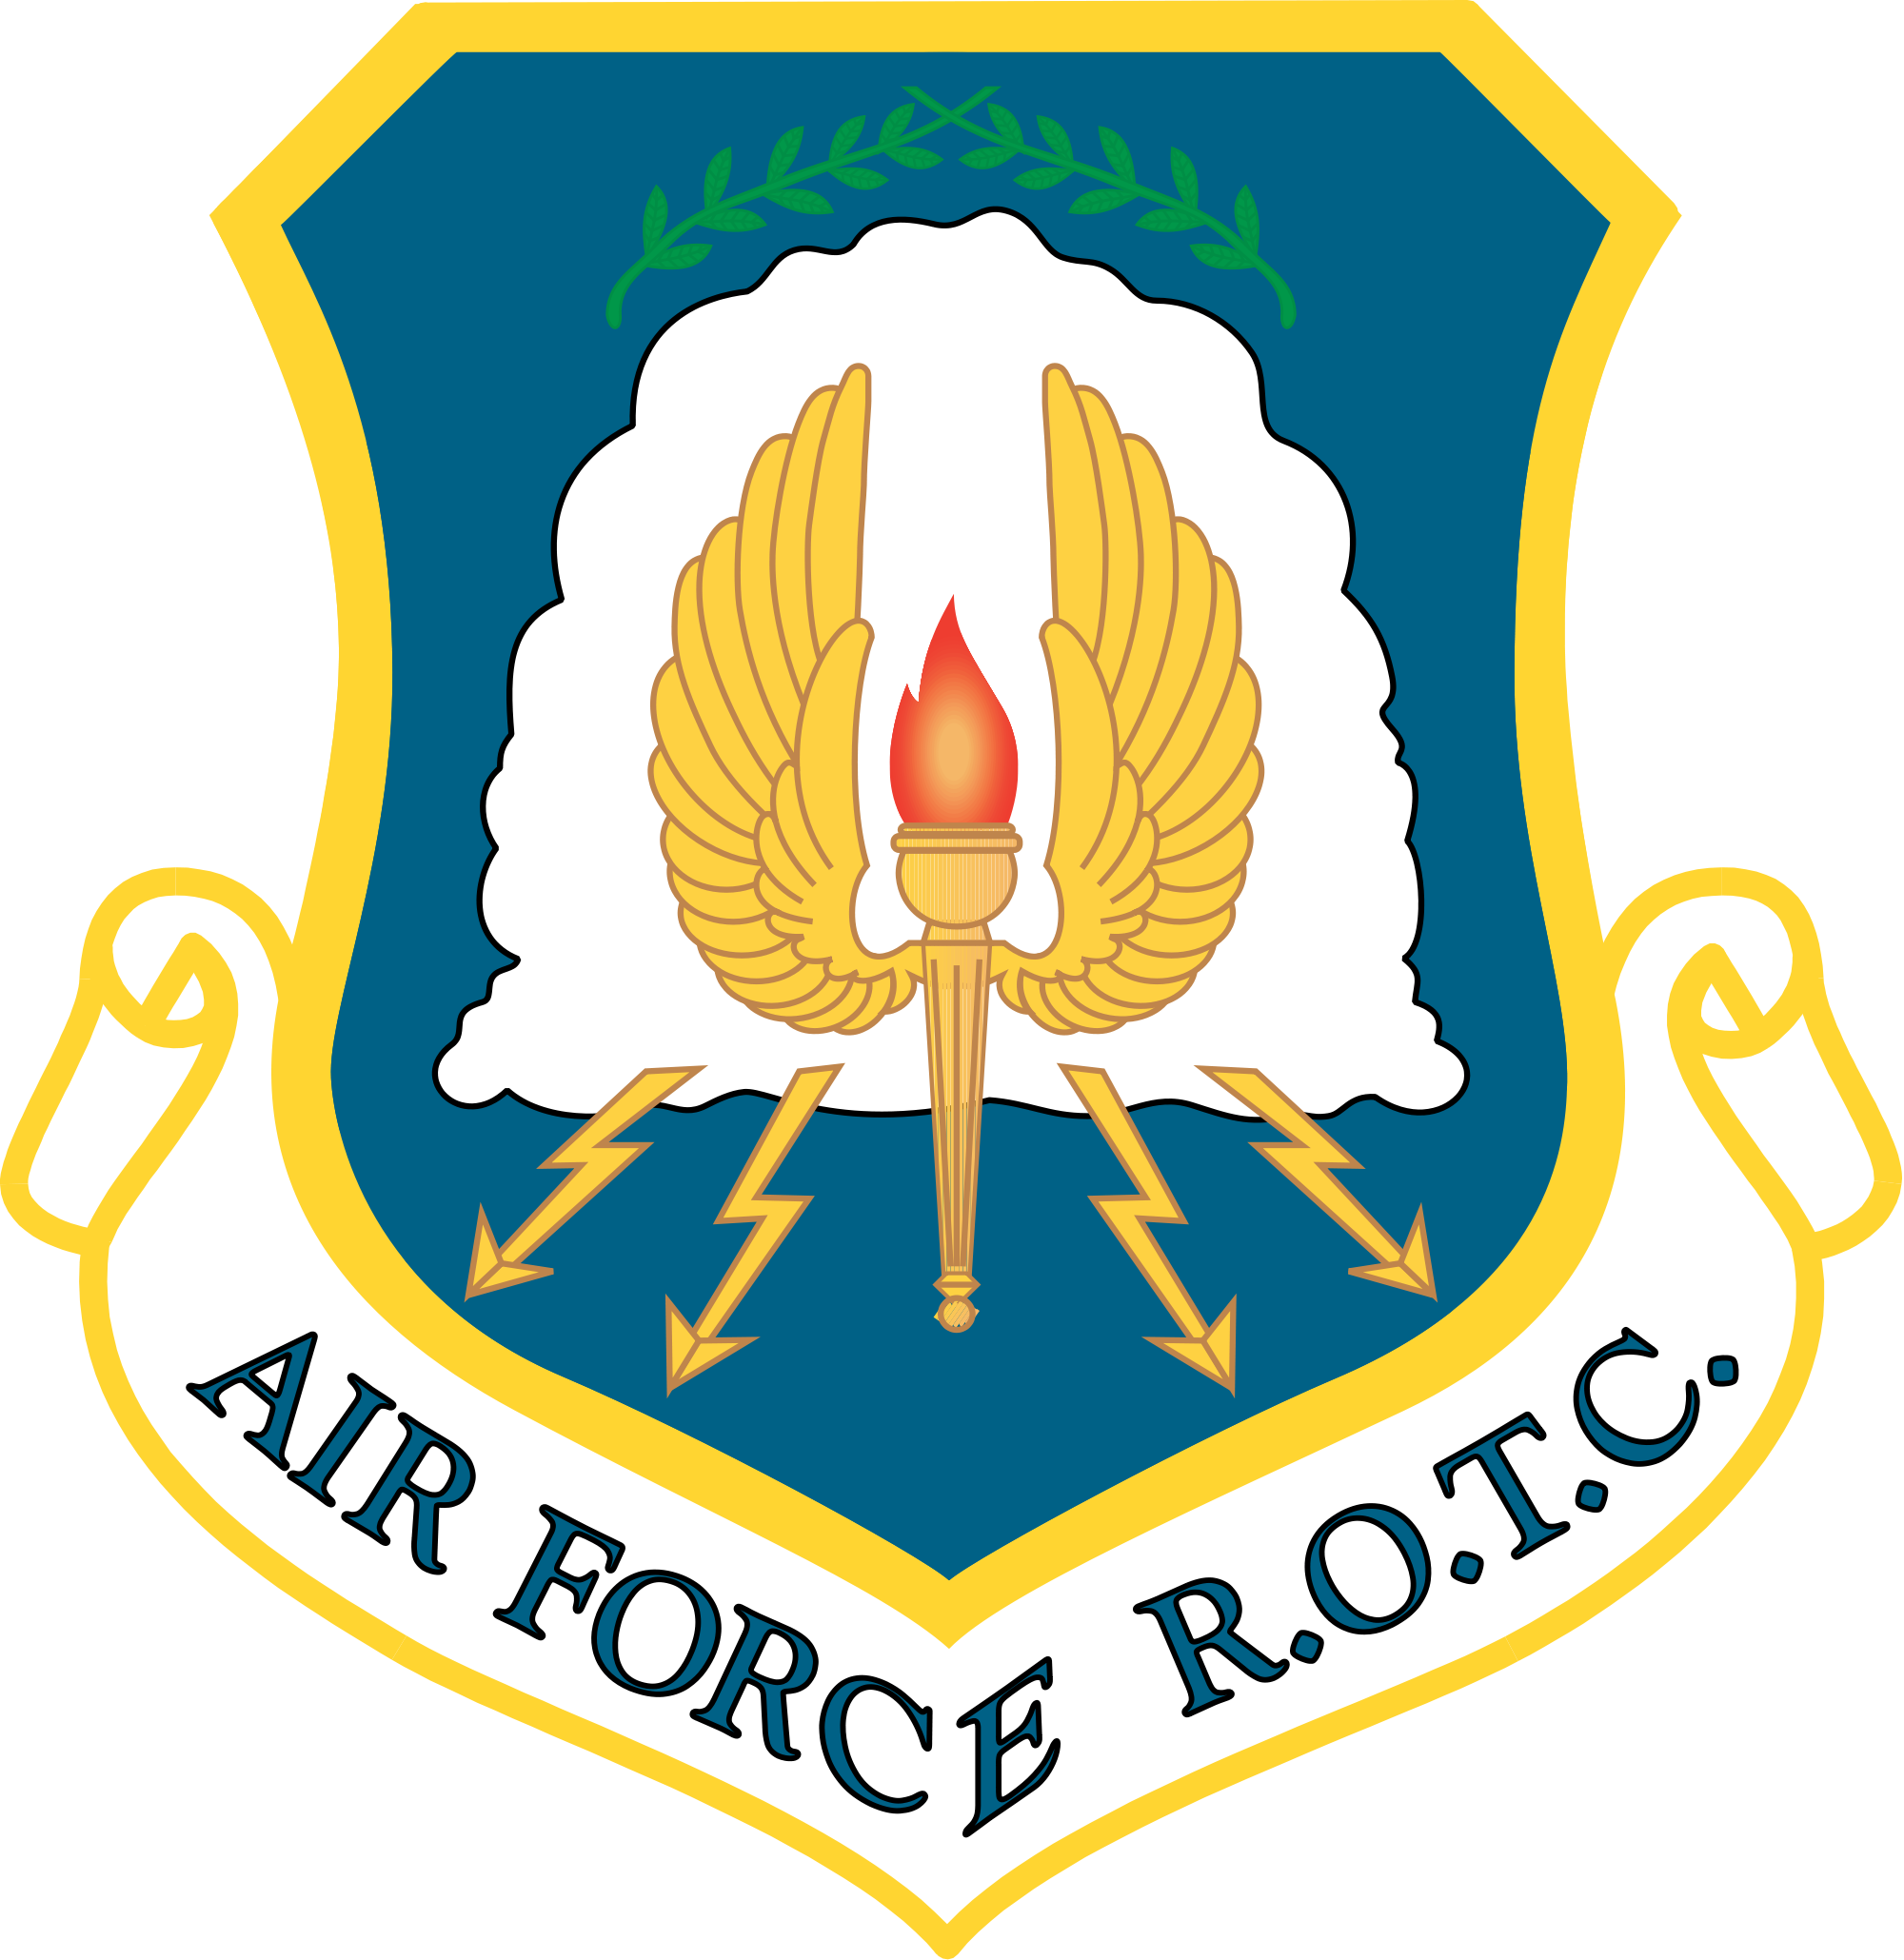 Navy clipart air force officer. Rotc scholarships blythewood jrotc